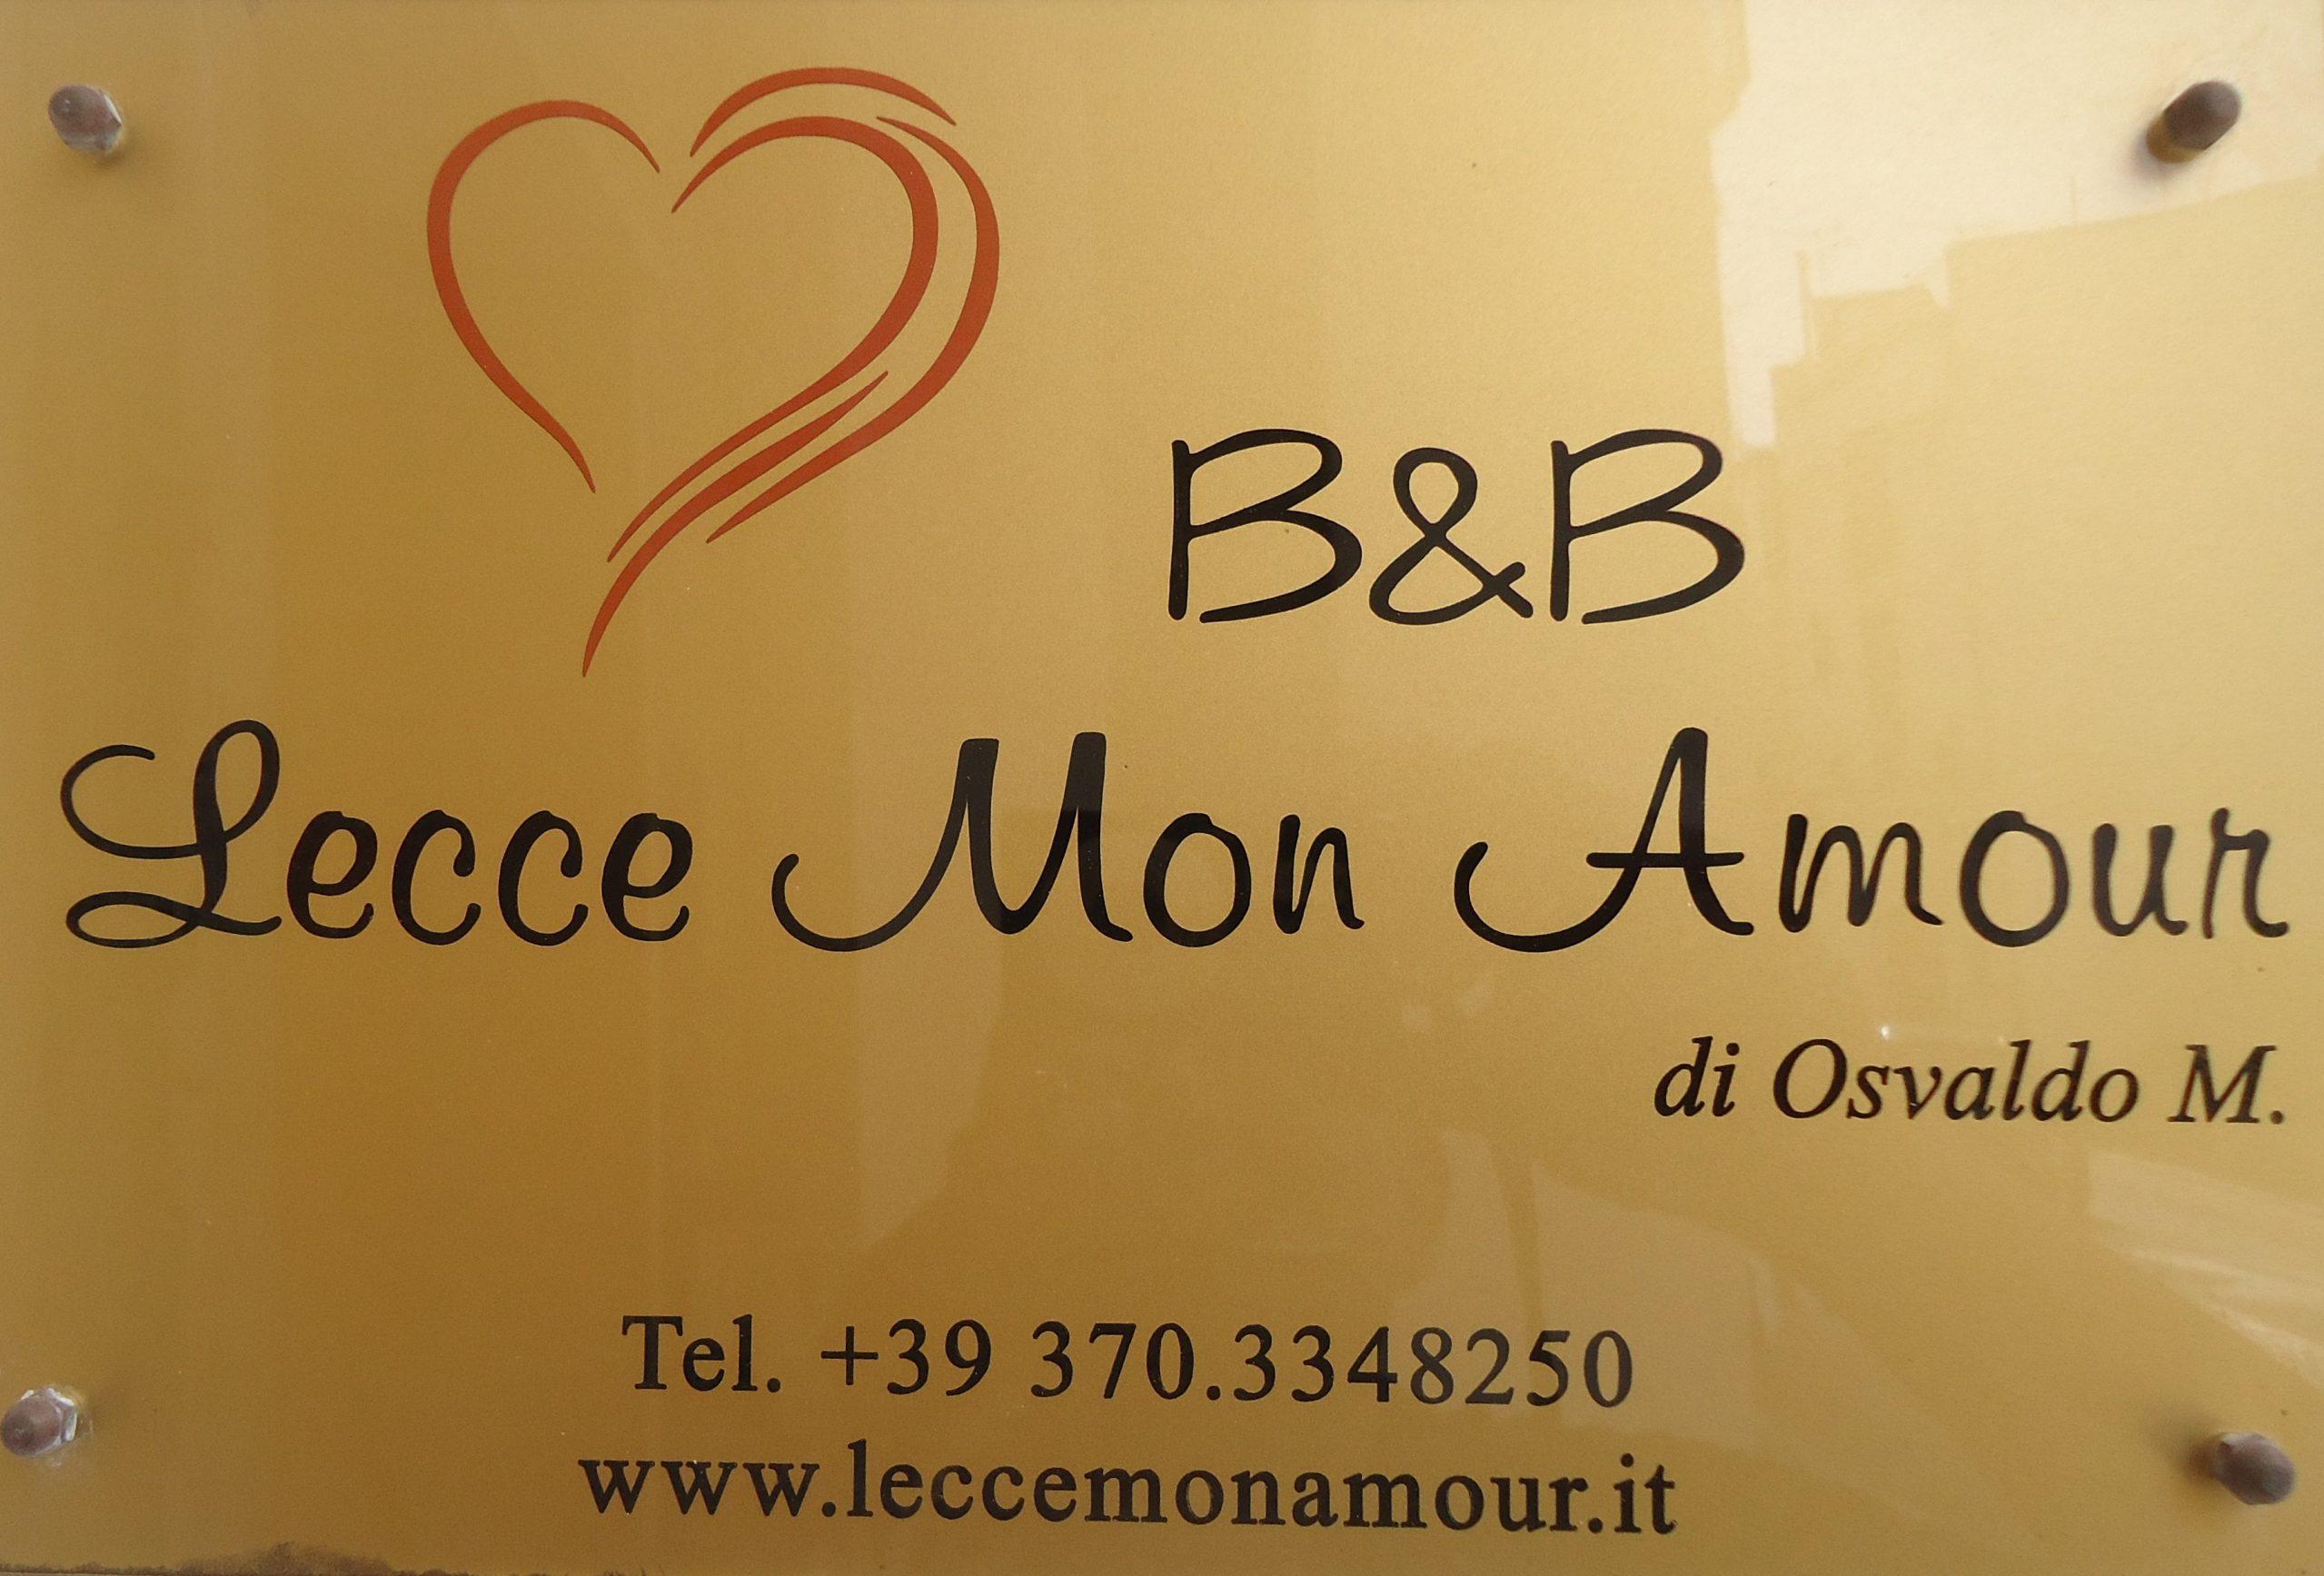 Lecce Mon Amour B&B       Tel. +39 3703348250